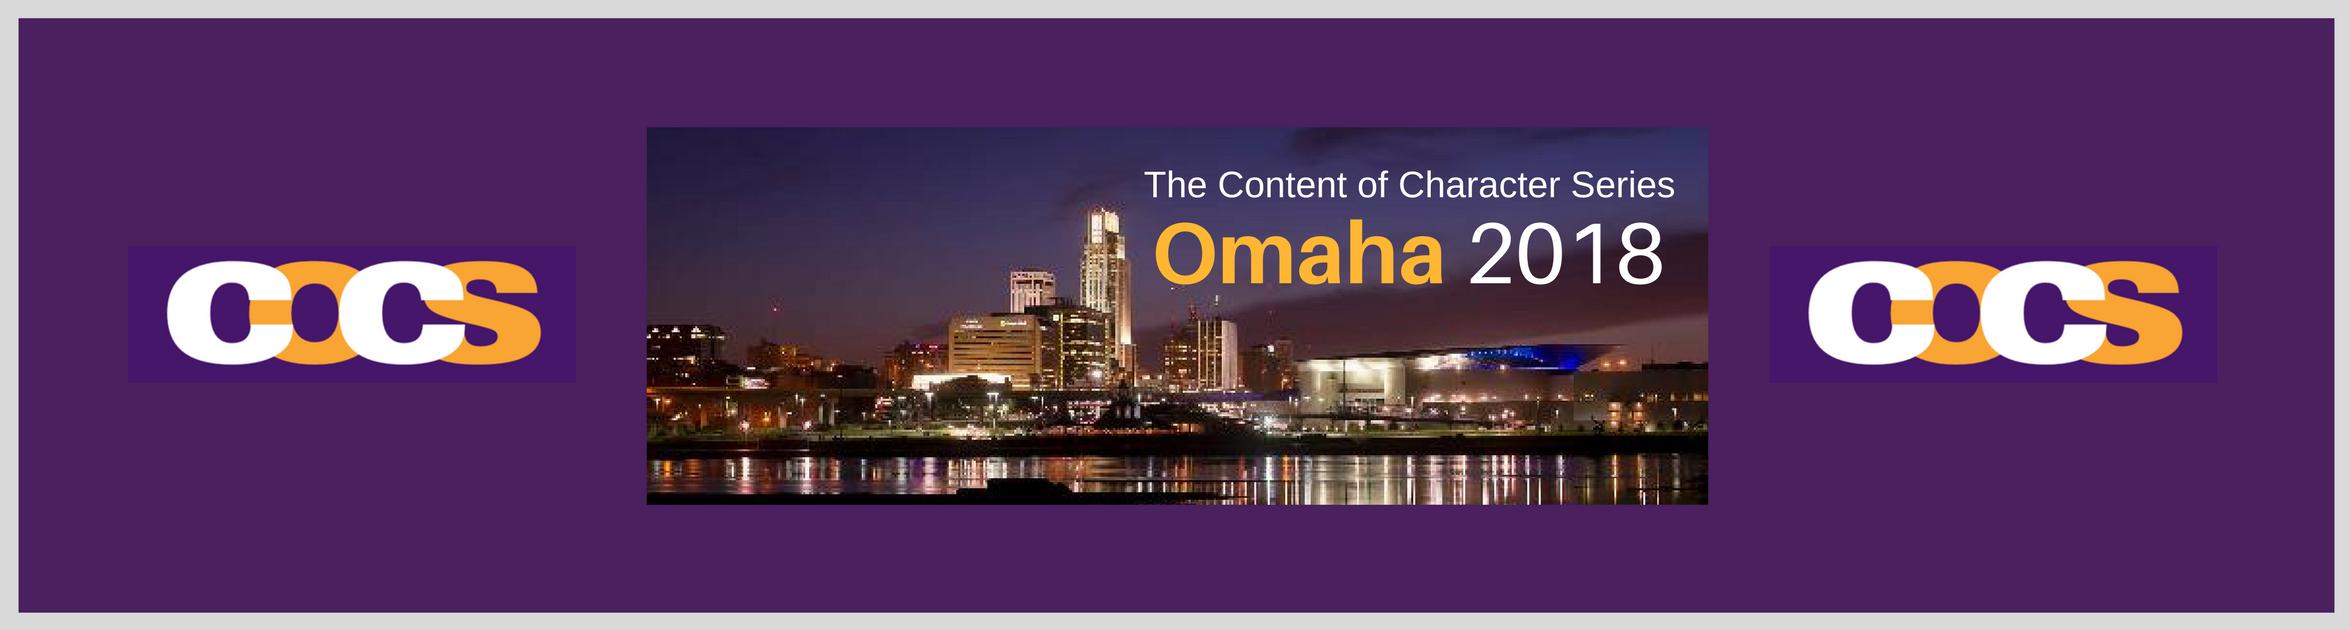 Omaha COCS 2018.png